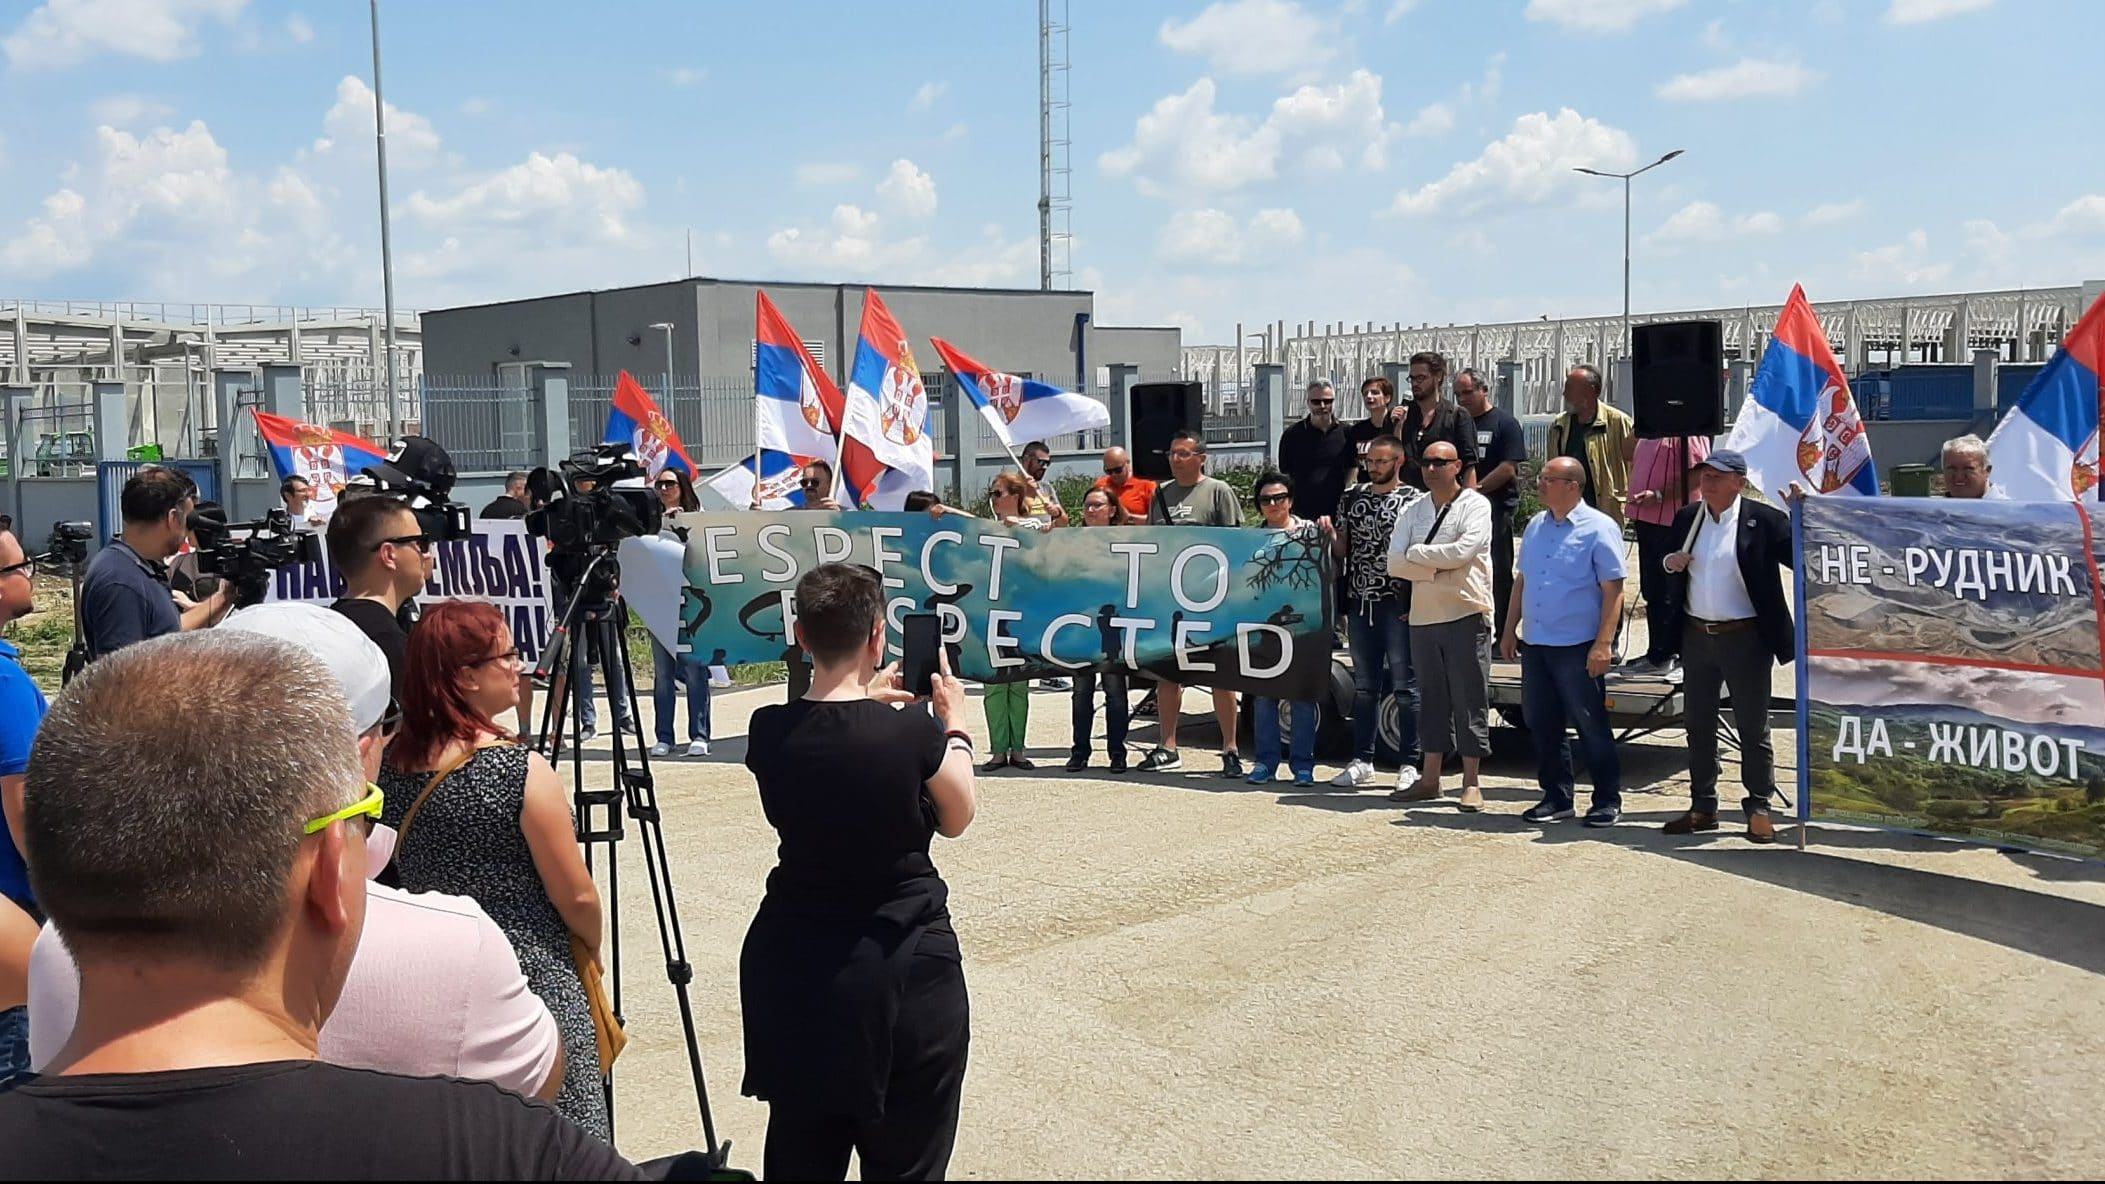 Zrenjanin: Veliki protest ispred Linglonga, protestanti traže poštovanje zakona i očuvanje životne sredine 1